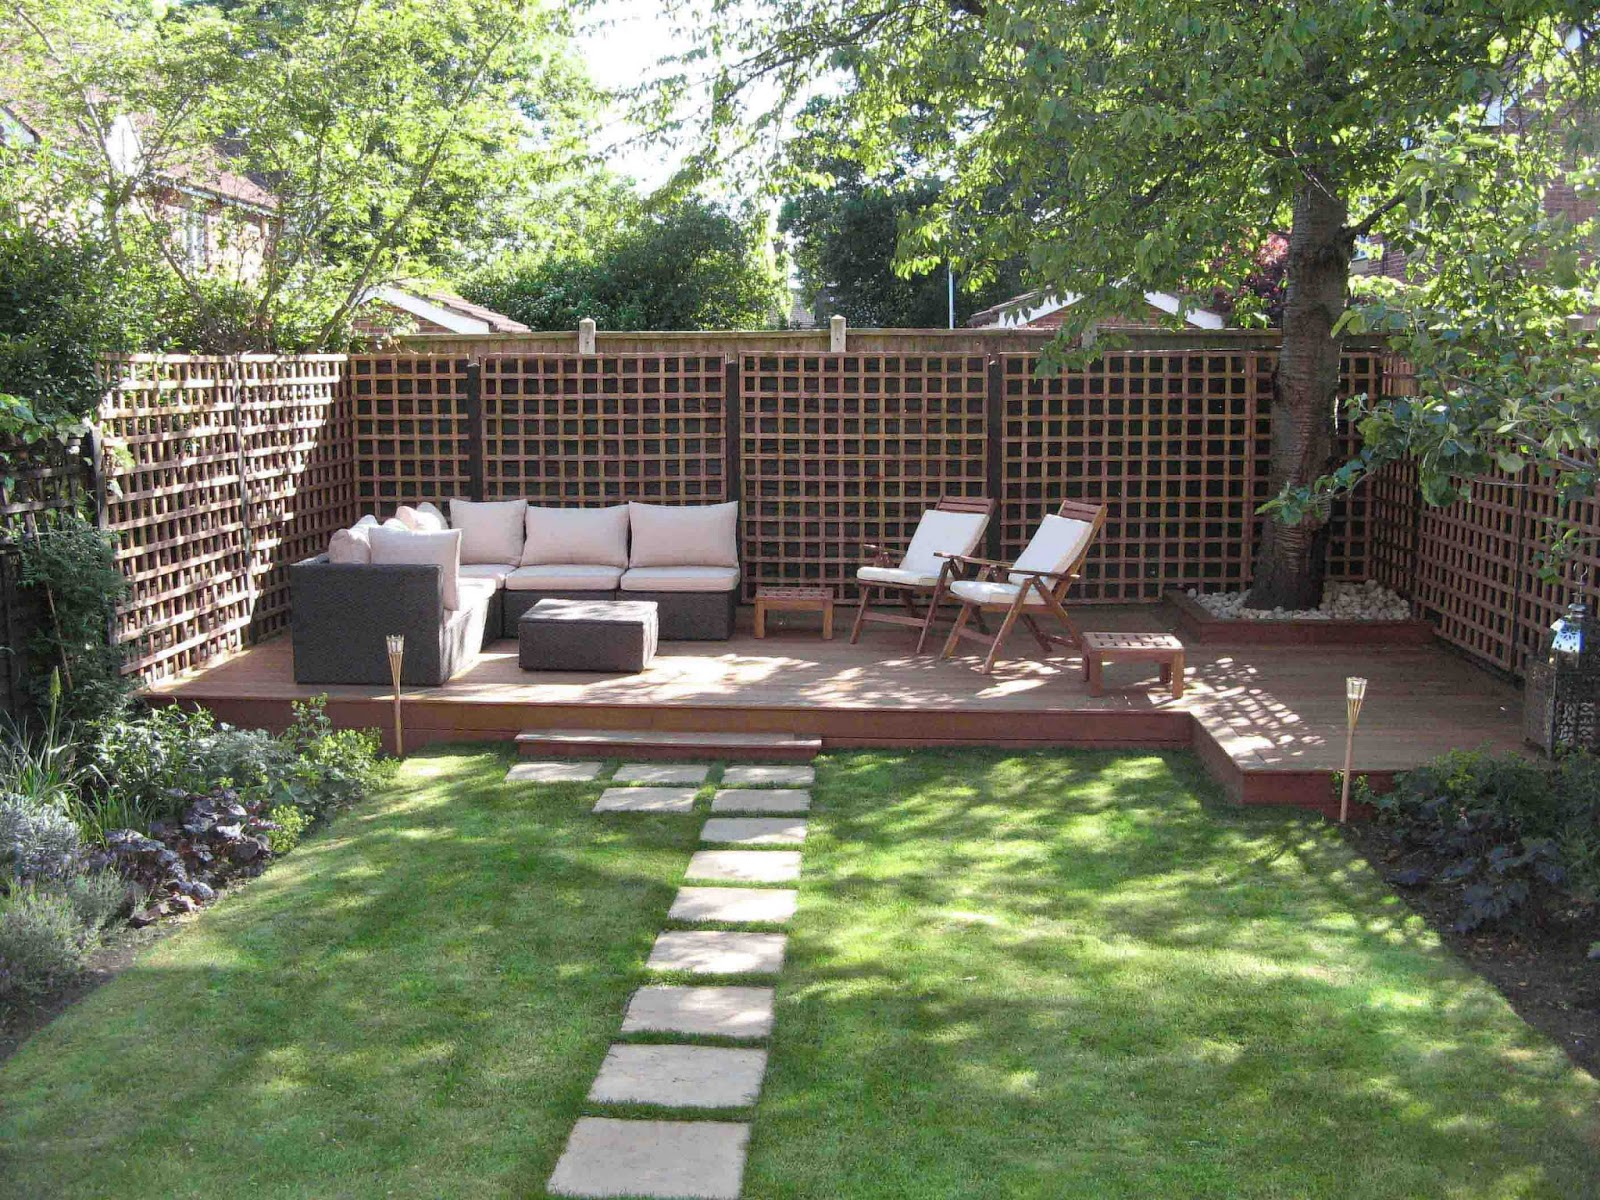 Terrasse Fond Jardin: Mon jardin et la cour ... - 24 photos ...